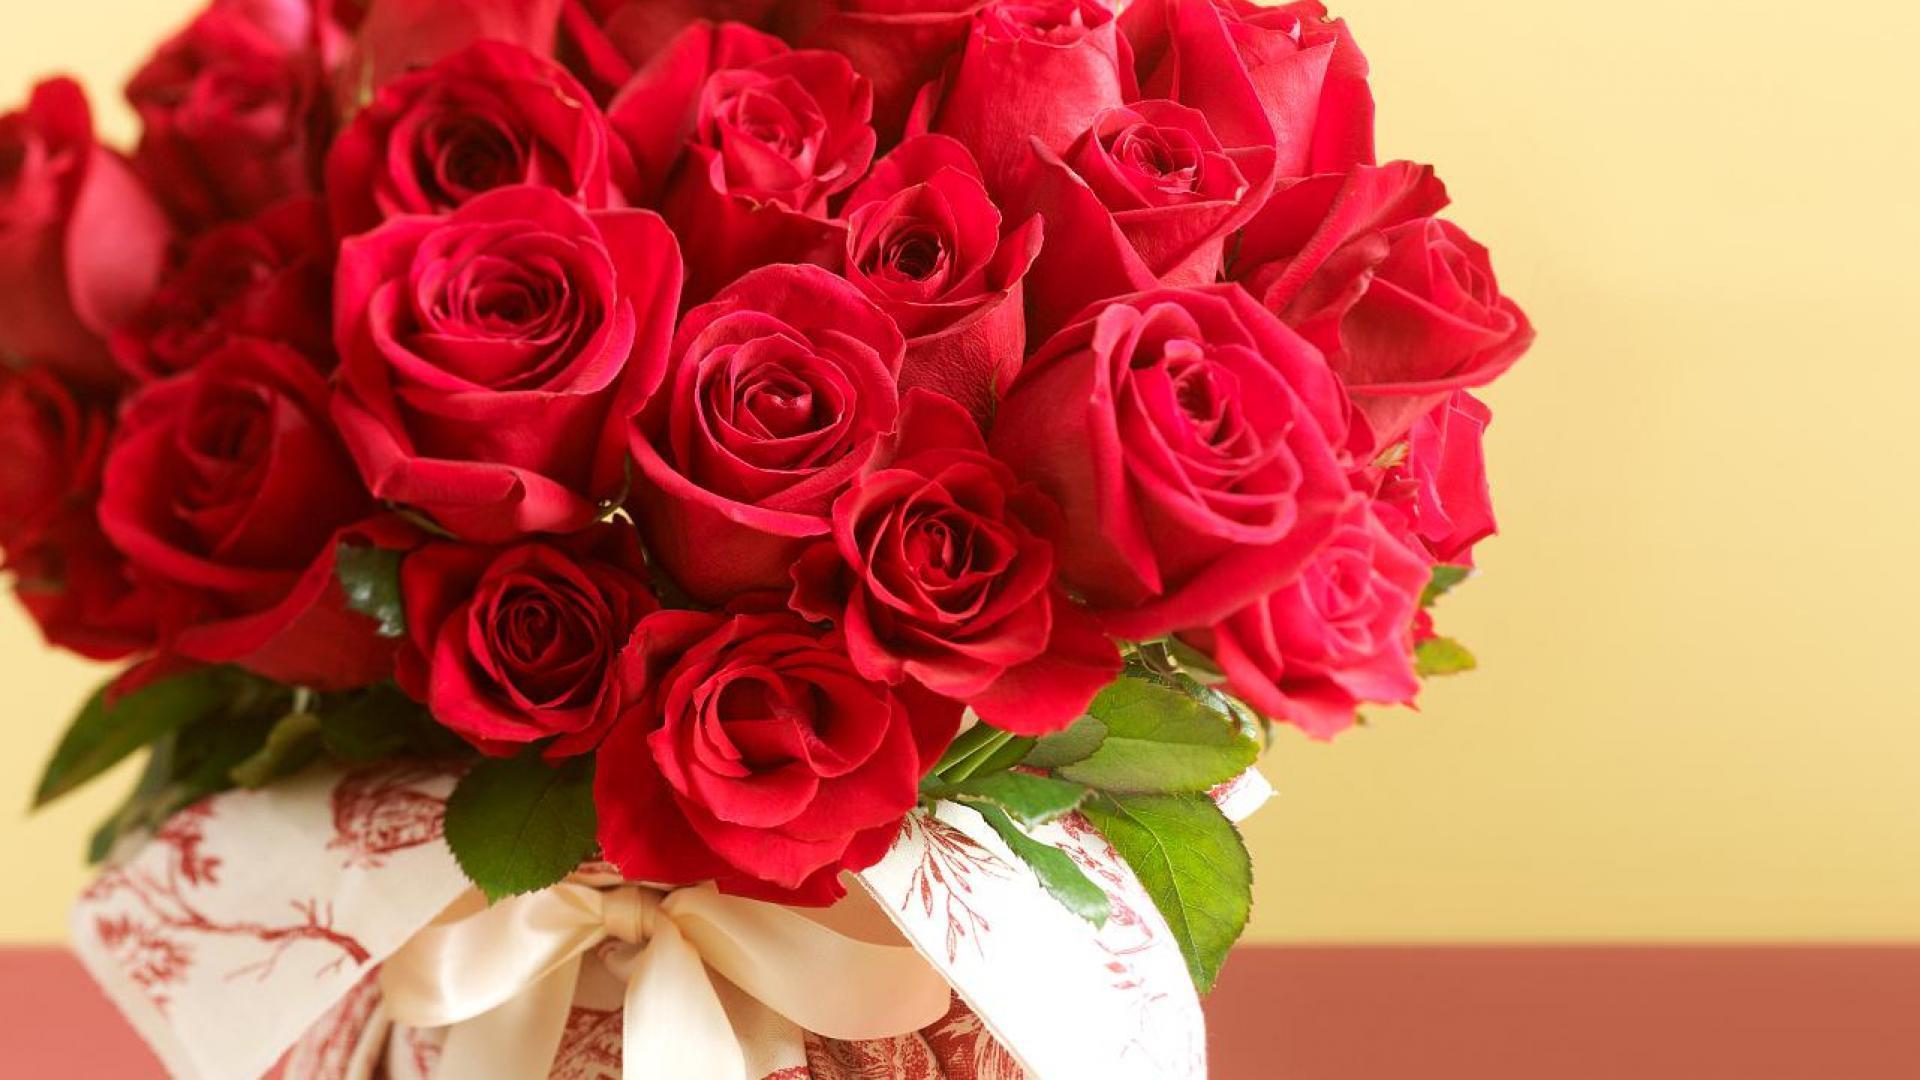 Best Rose wallpaper ideas on Pinterest Screensaver Flower